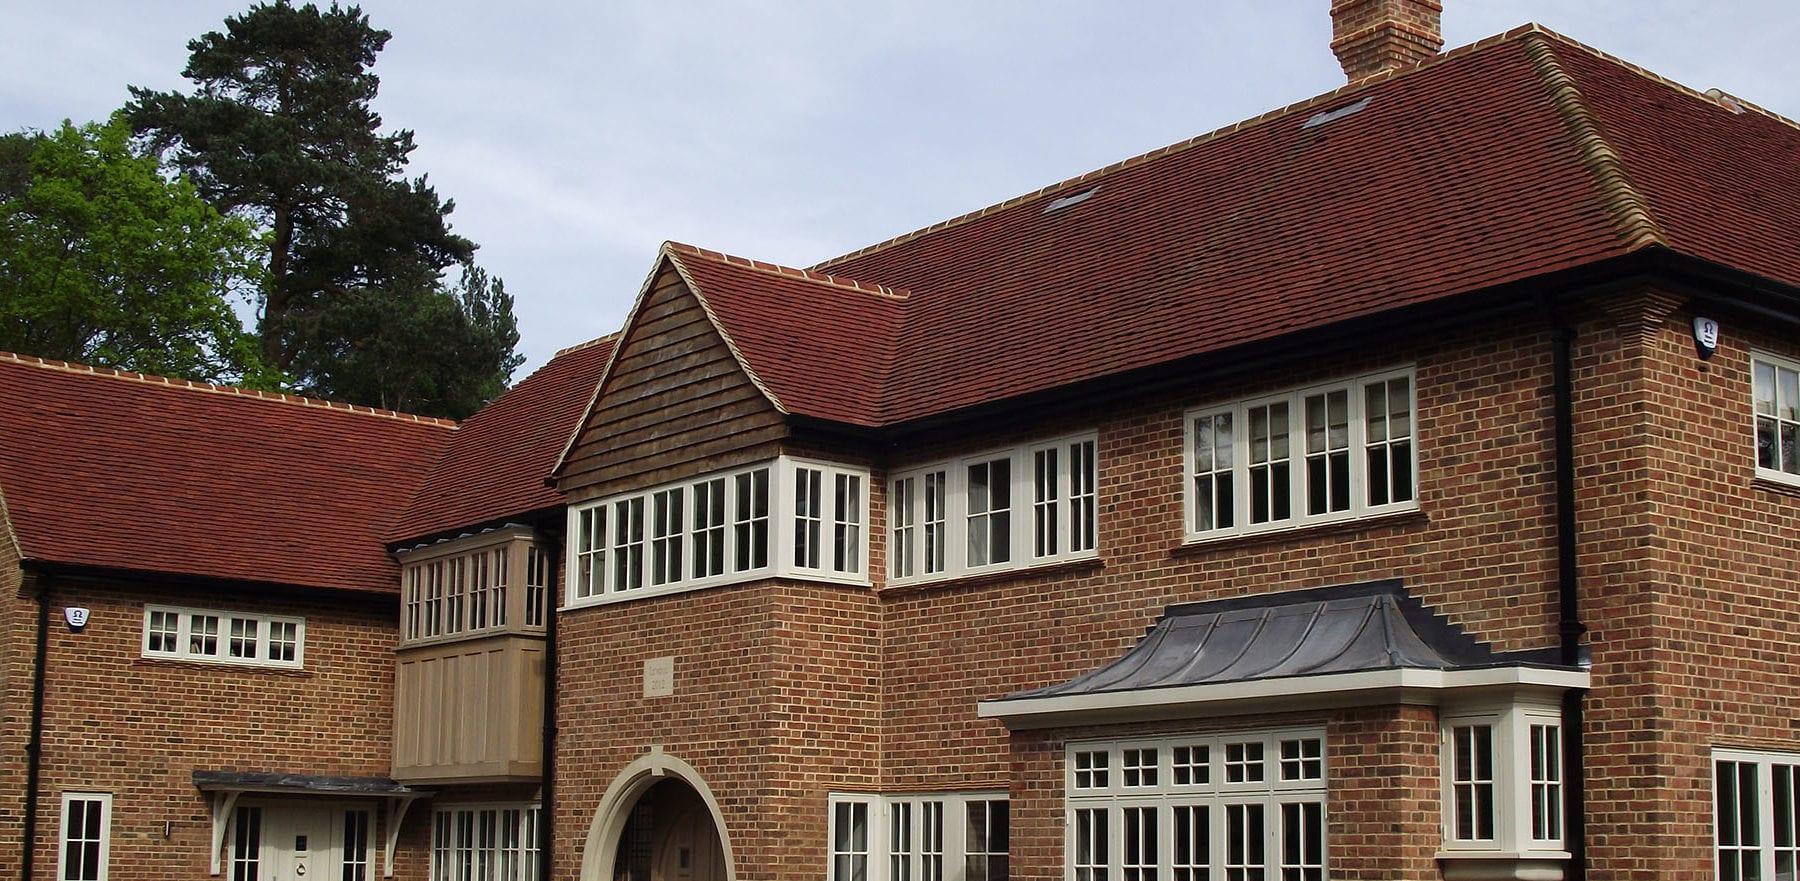 Lifestiles - Handmade Heather Clay Roof Tiles - Godalming, England 3